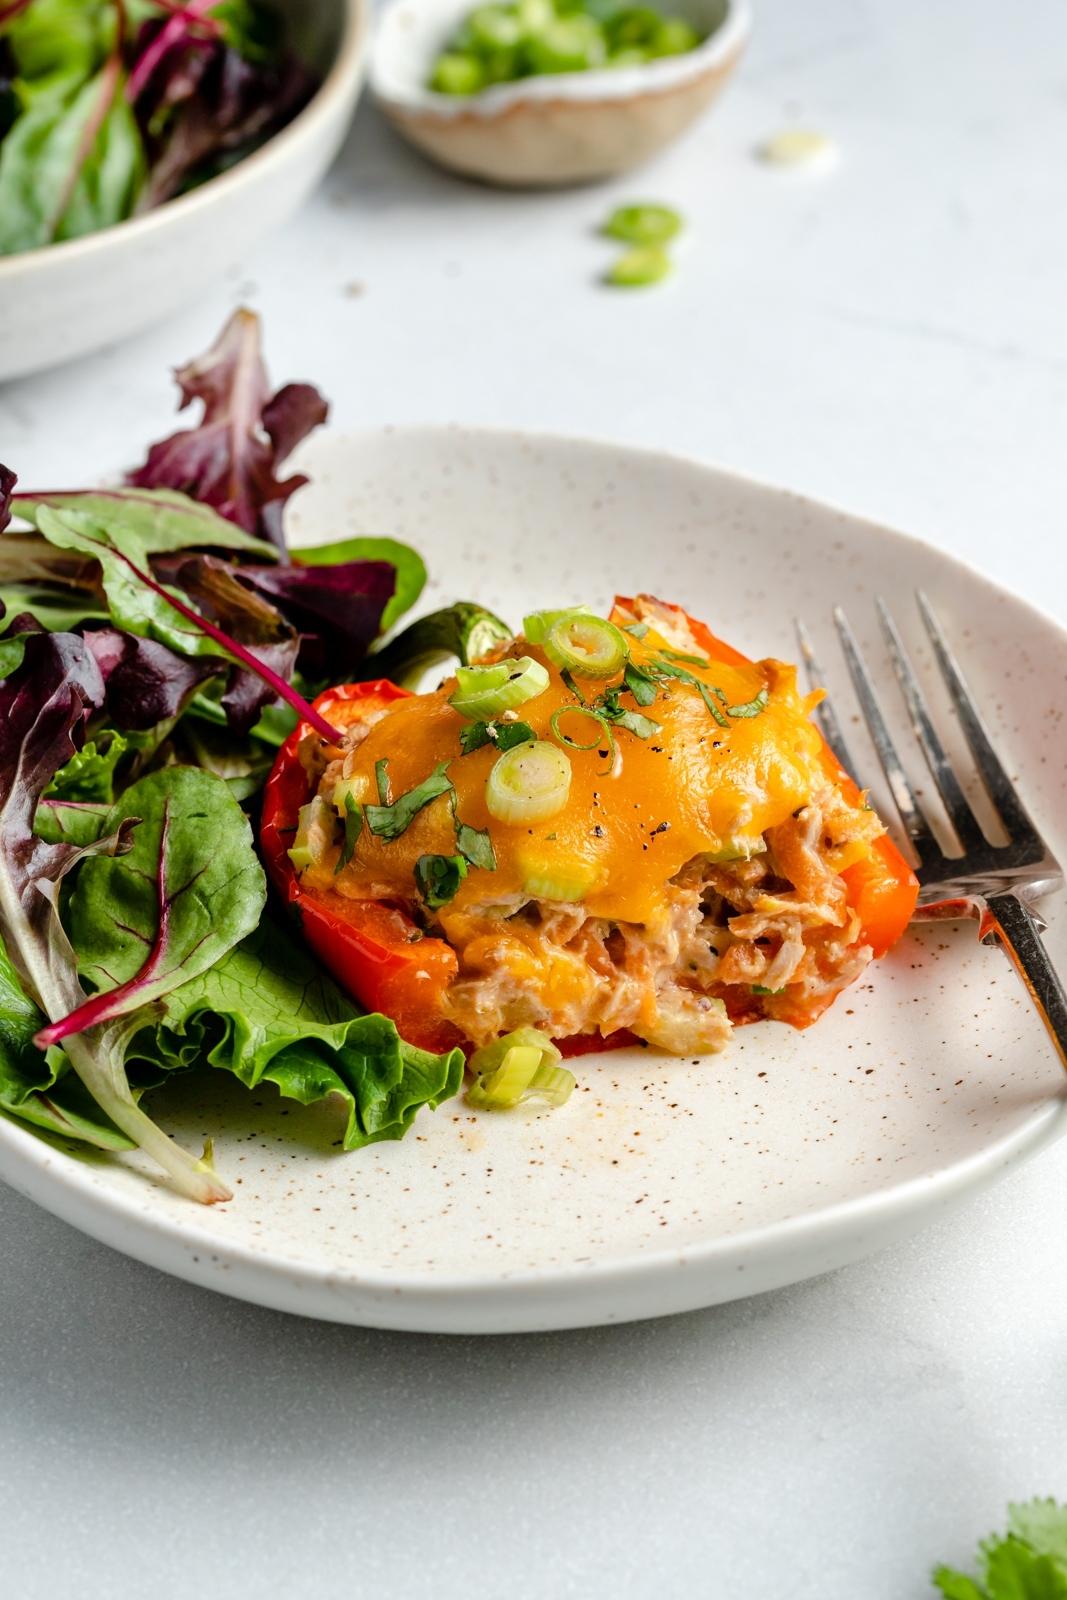 tuna melt stuffed pepper on a plate with a side salad